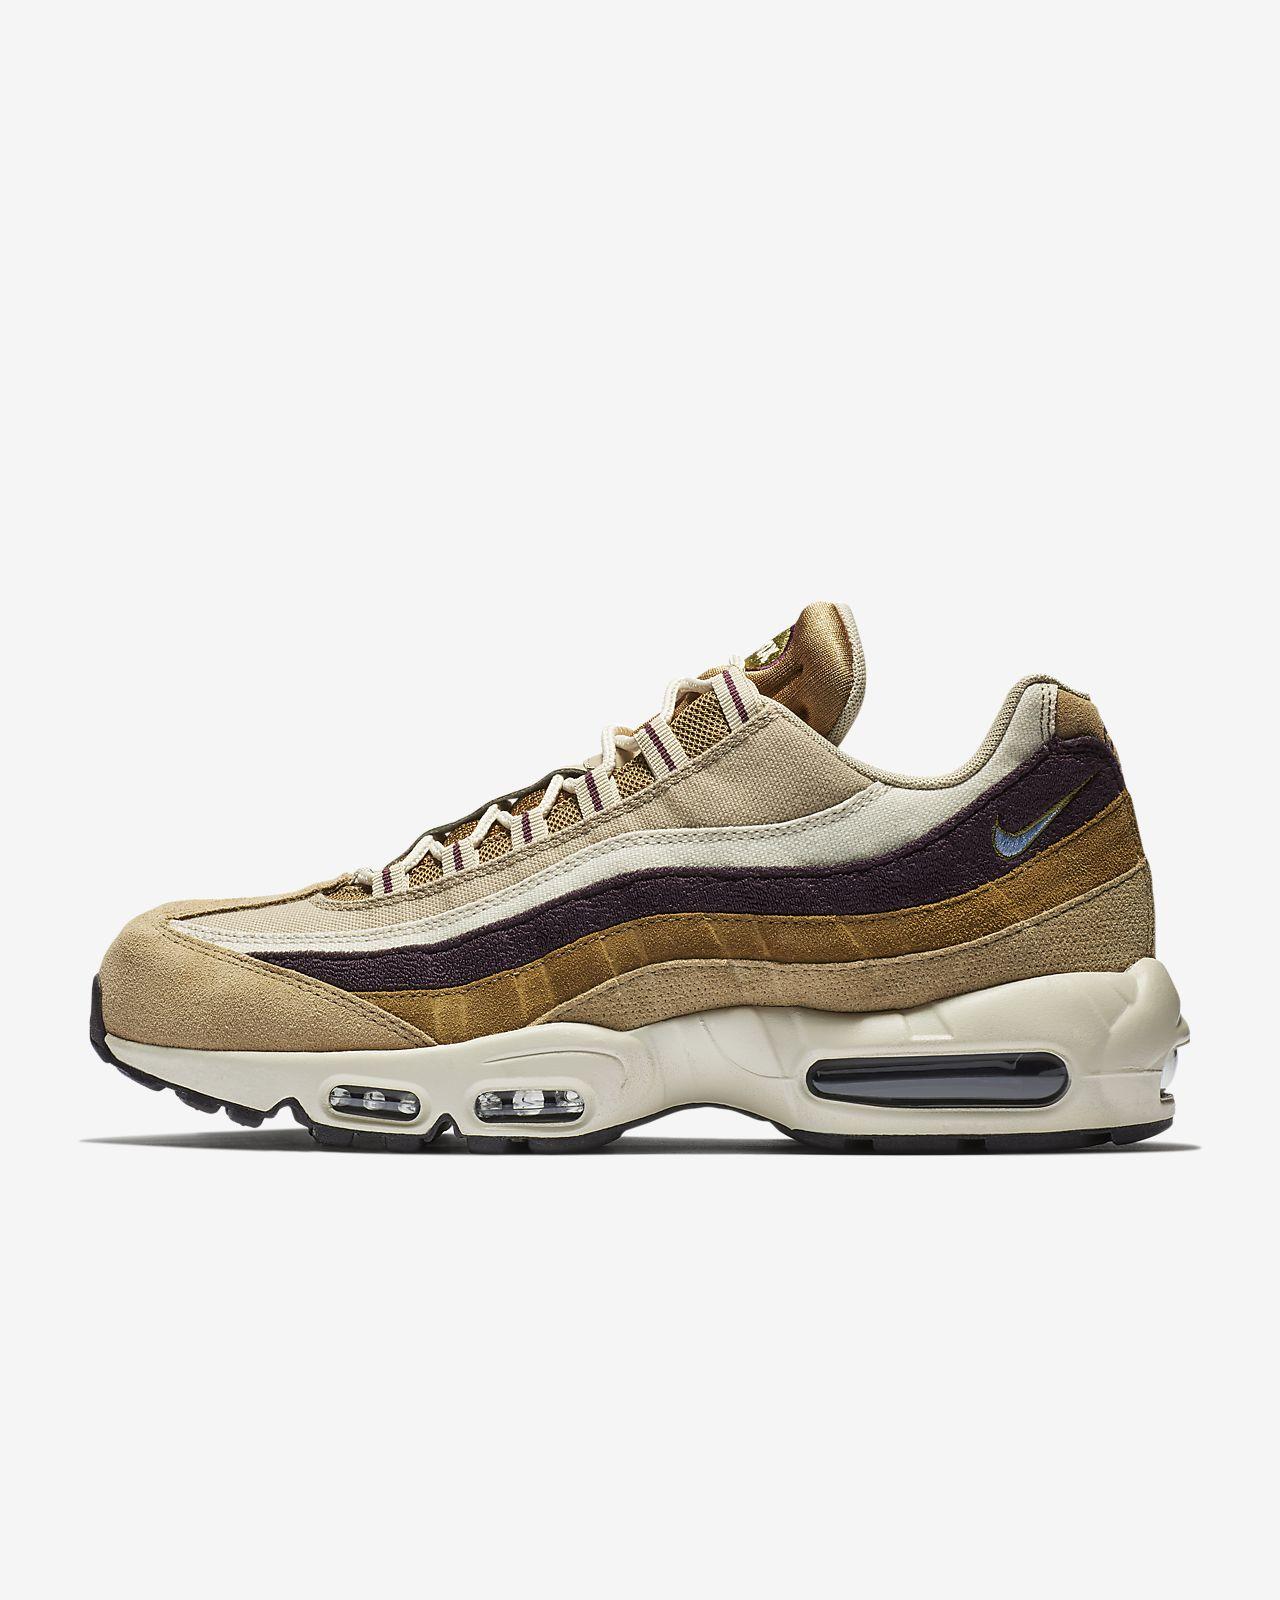 4172887eb4 Nike Air Max 95 Premium Men's Shoe. Nike.com